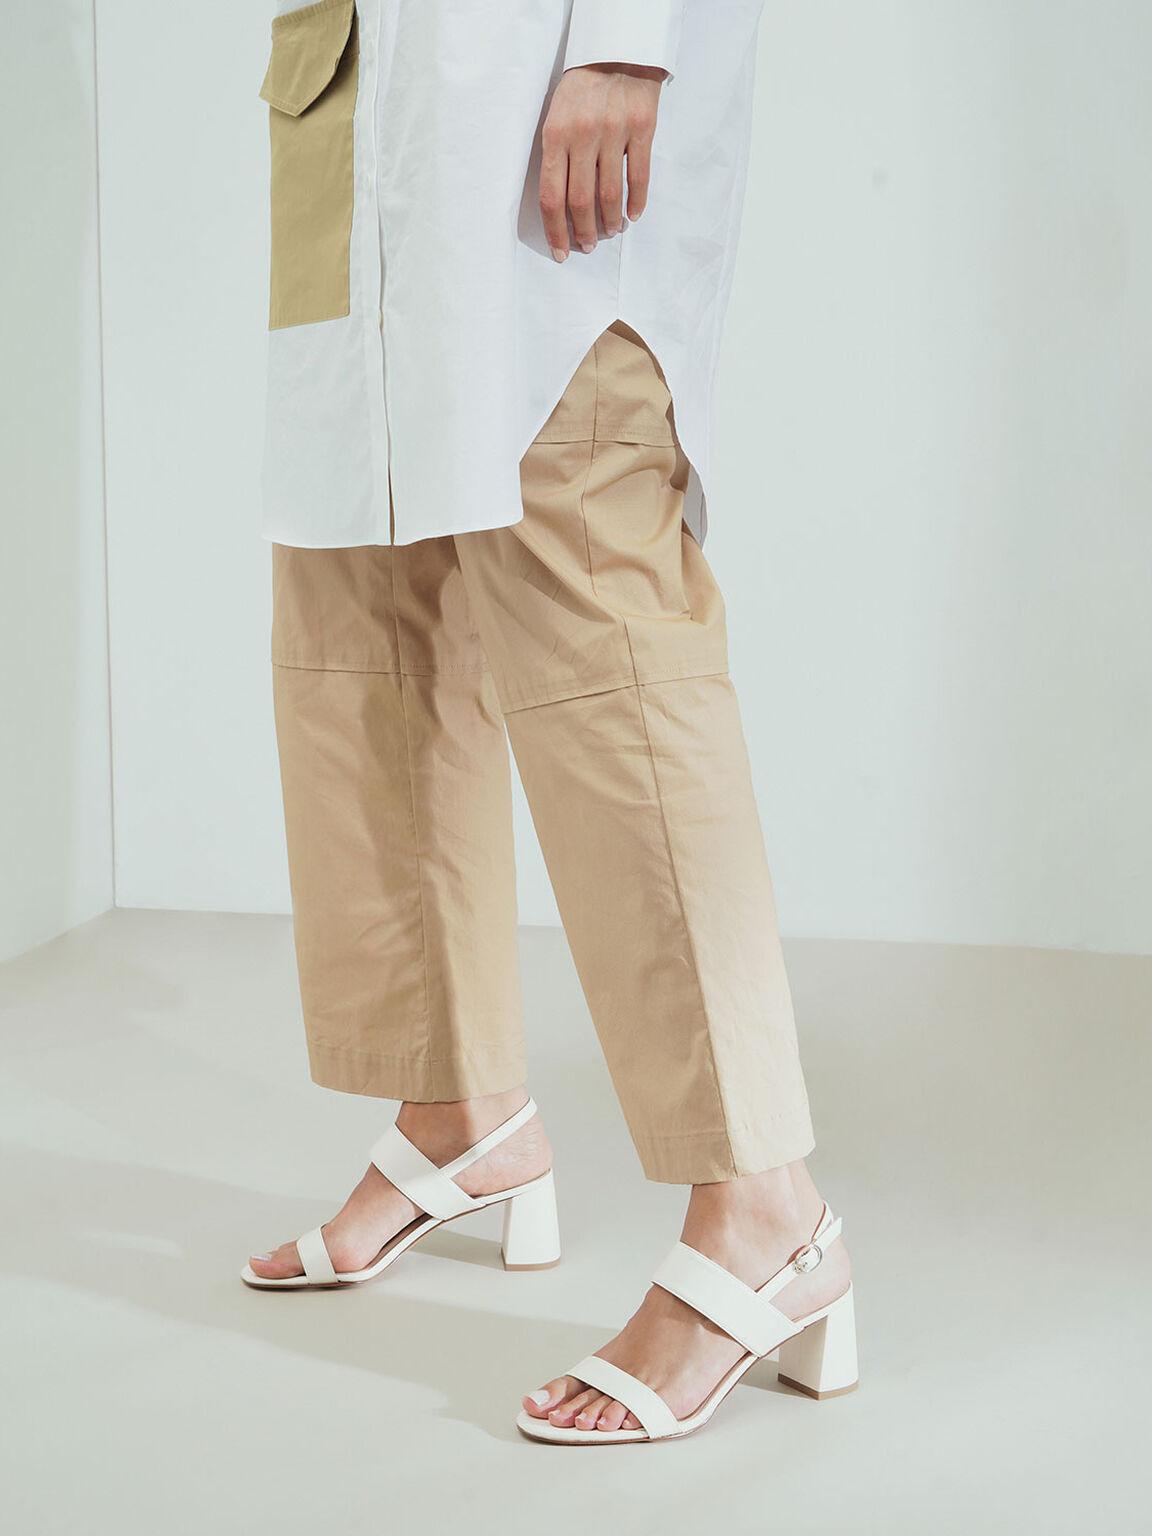 Slingback Heeled Sandals, Cream, hi-res